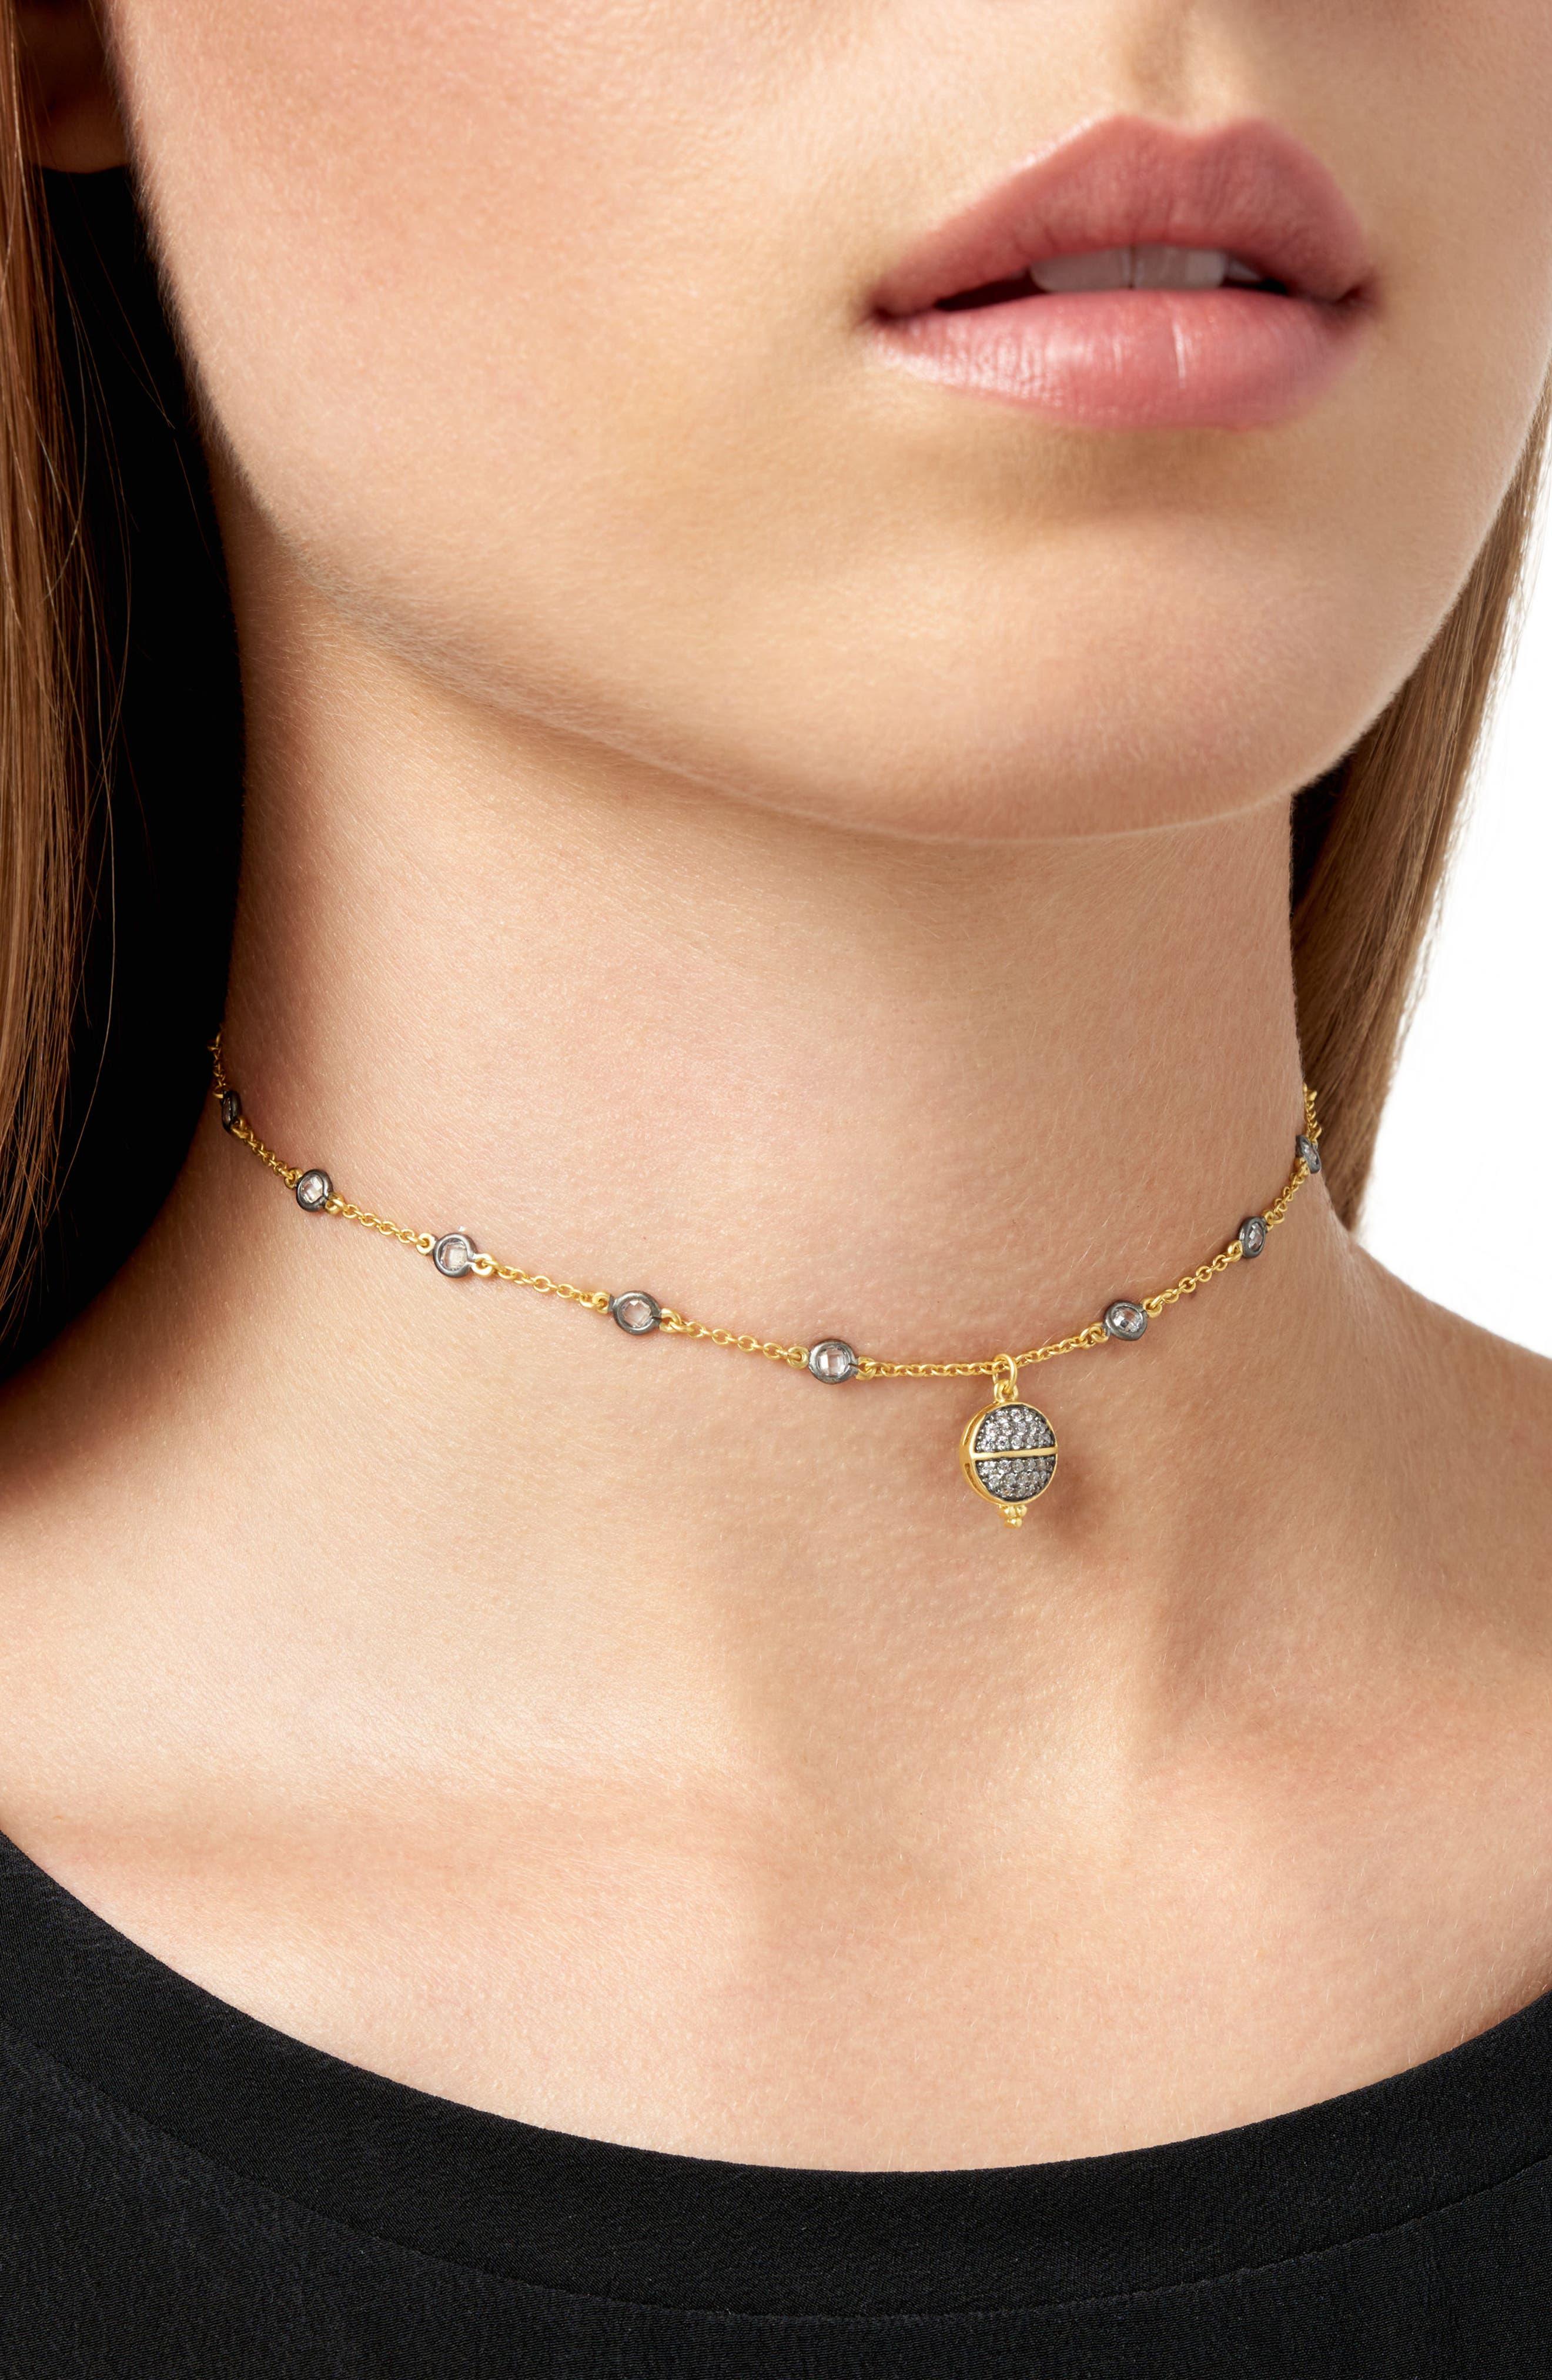 Textured Ornaments Choker Necklace,                             Alternate thumbnail 2, color,                             710